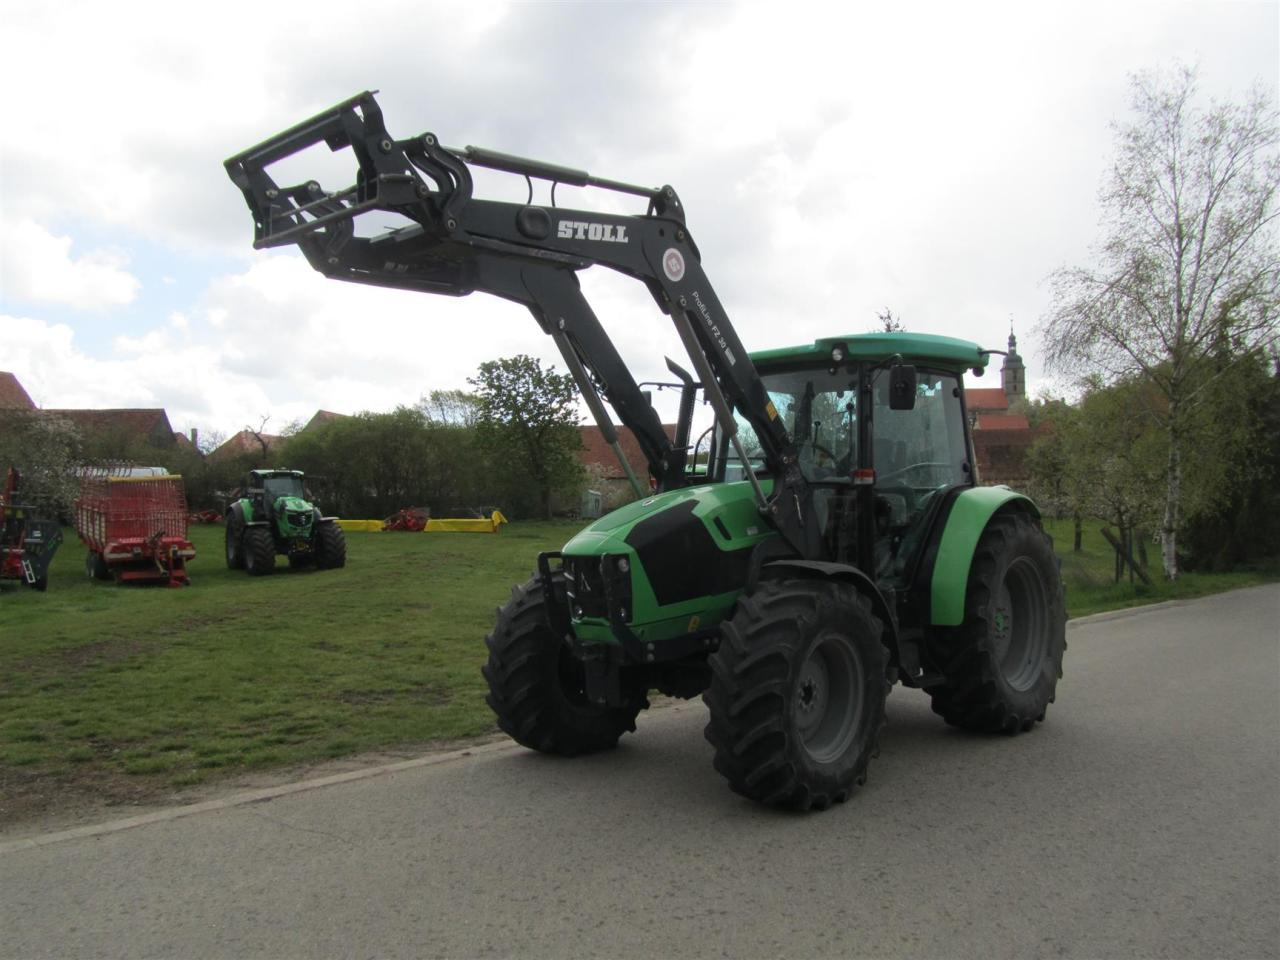 Deutz-Fahr Agrotron 5105.4 G H